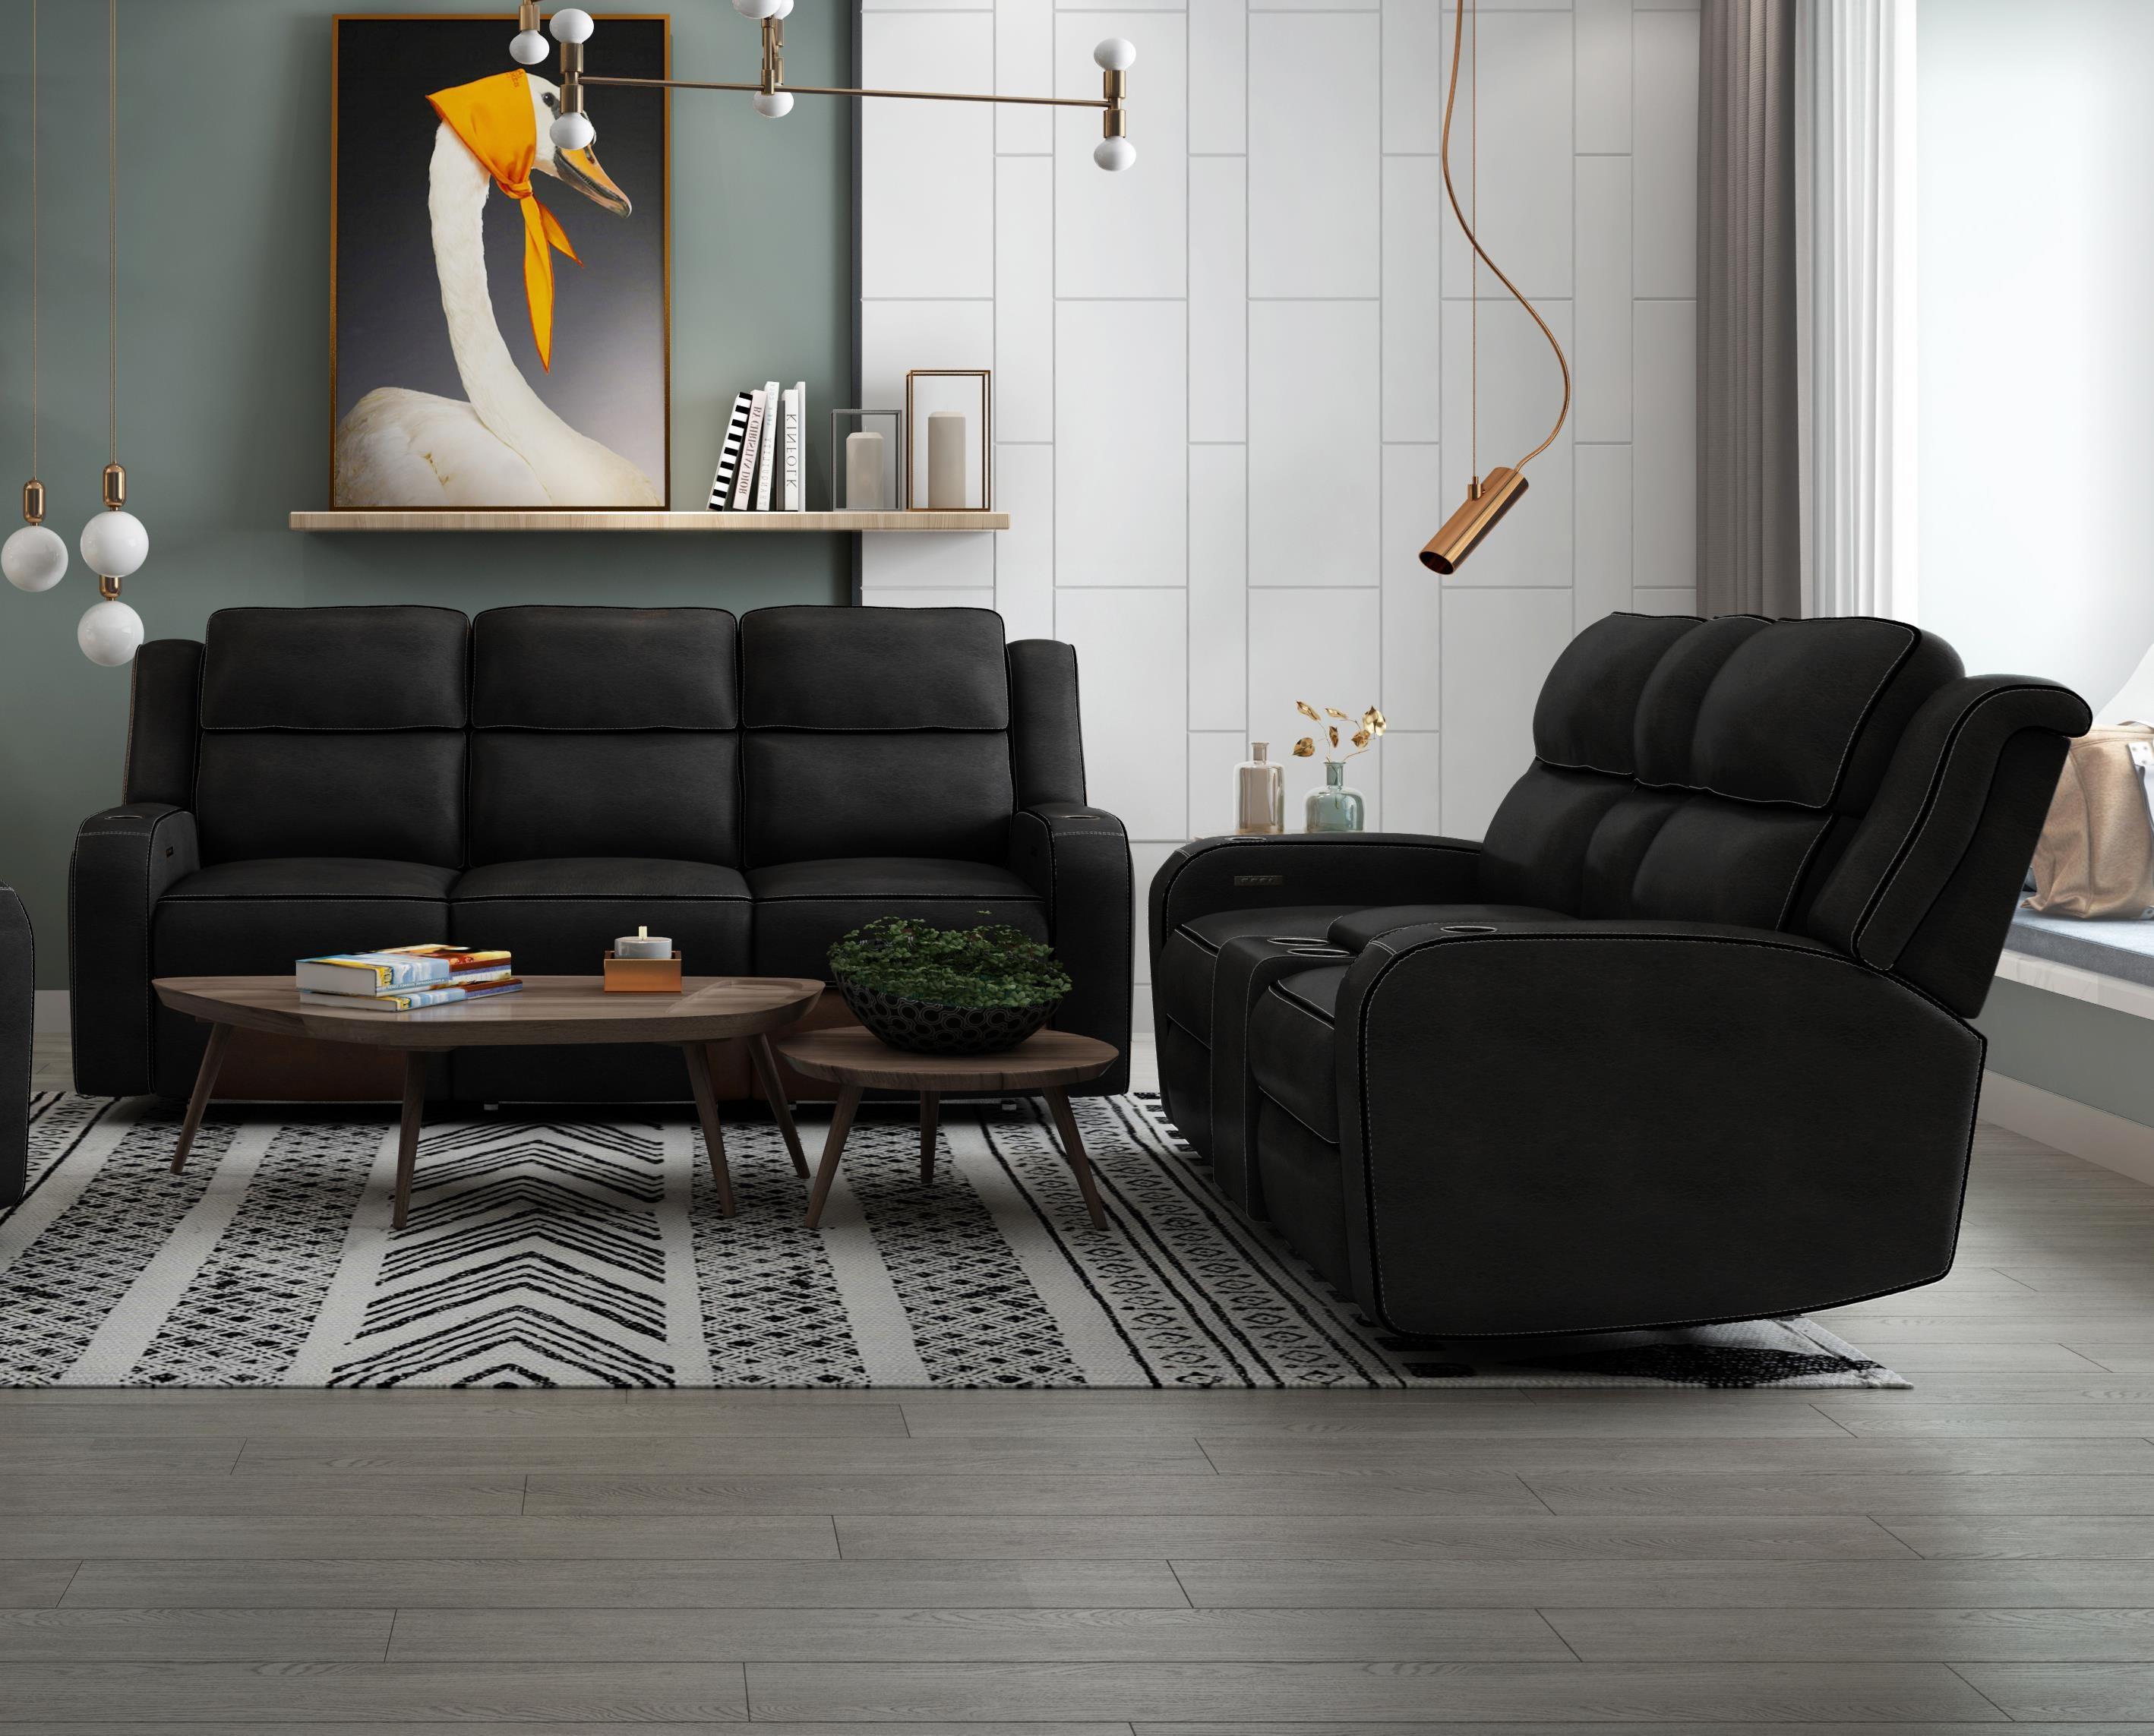 2 PC Power Living Room Set